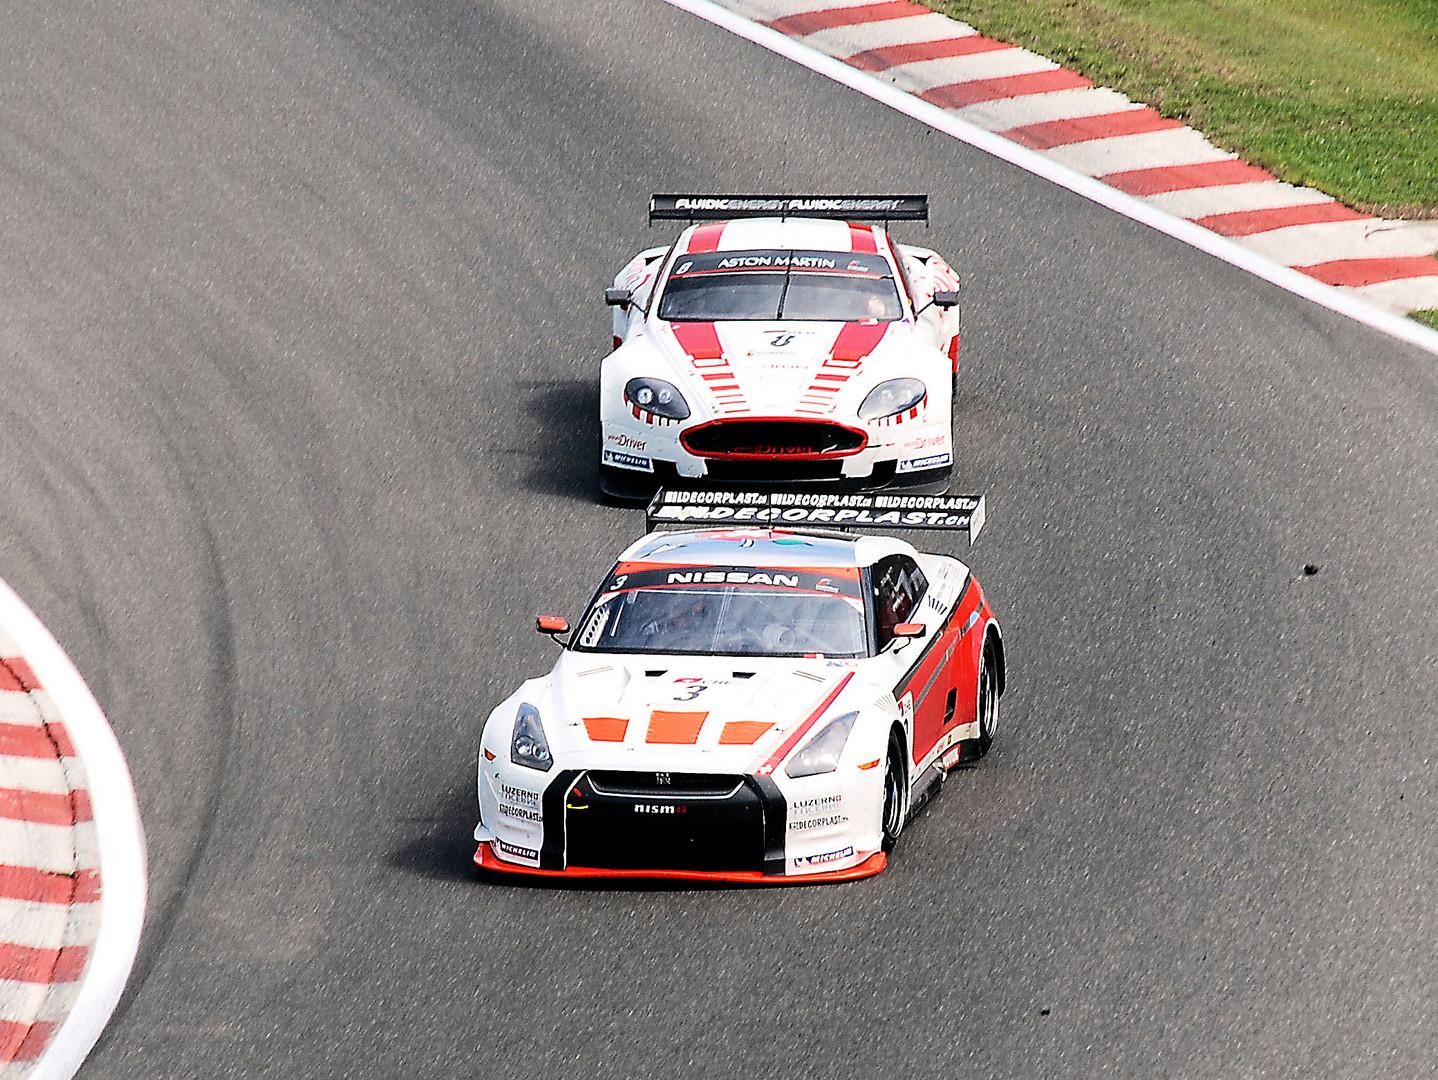 #3 Nissan GT-R #8 Aston Martin